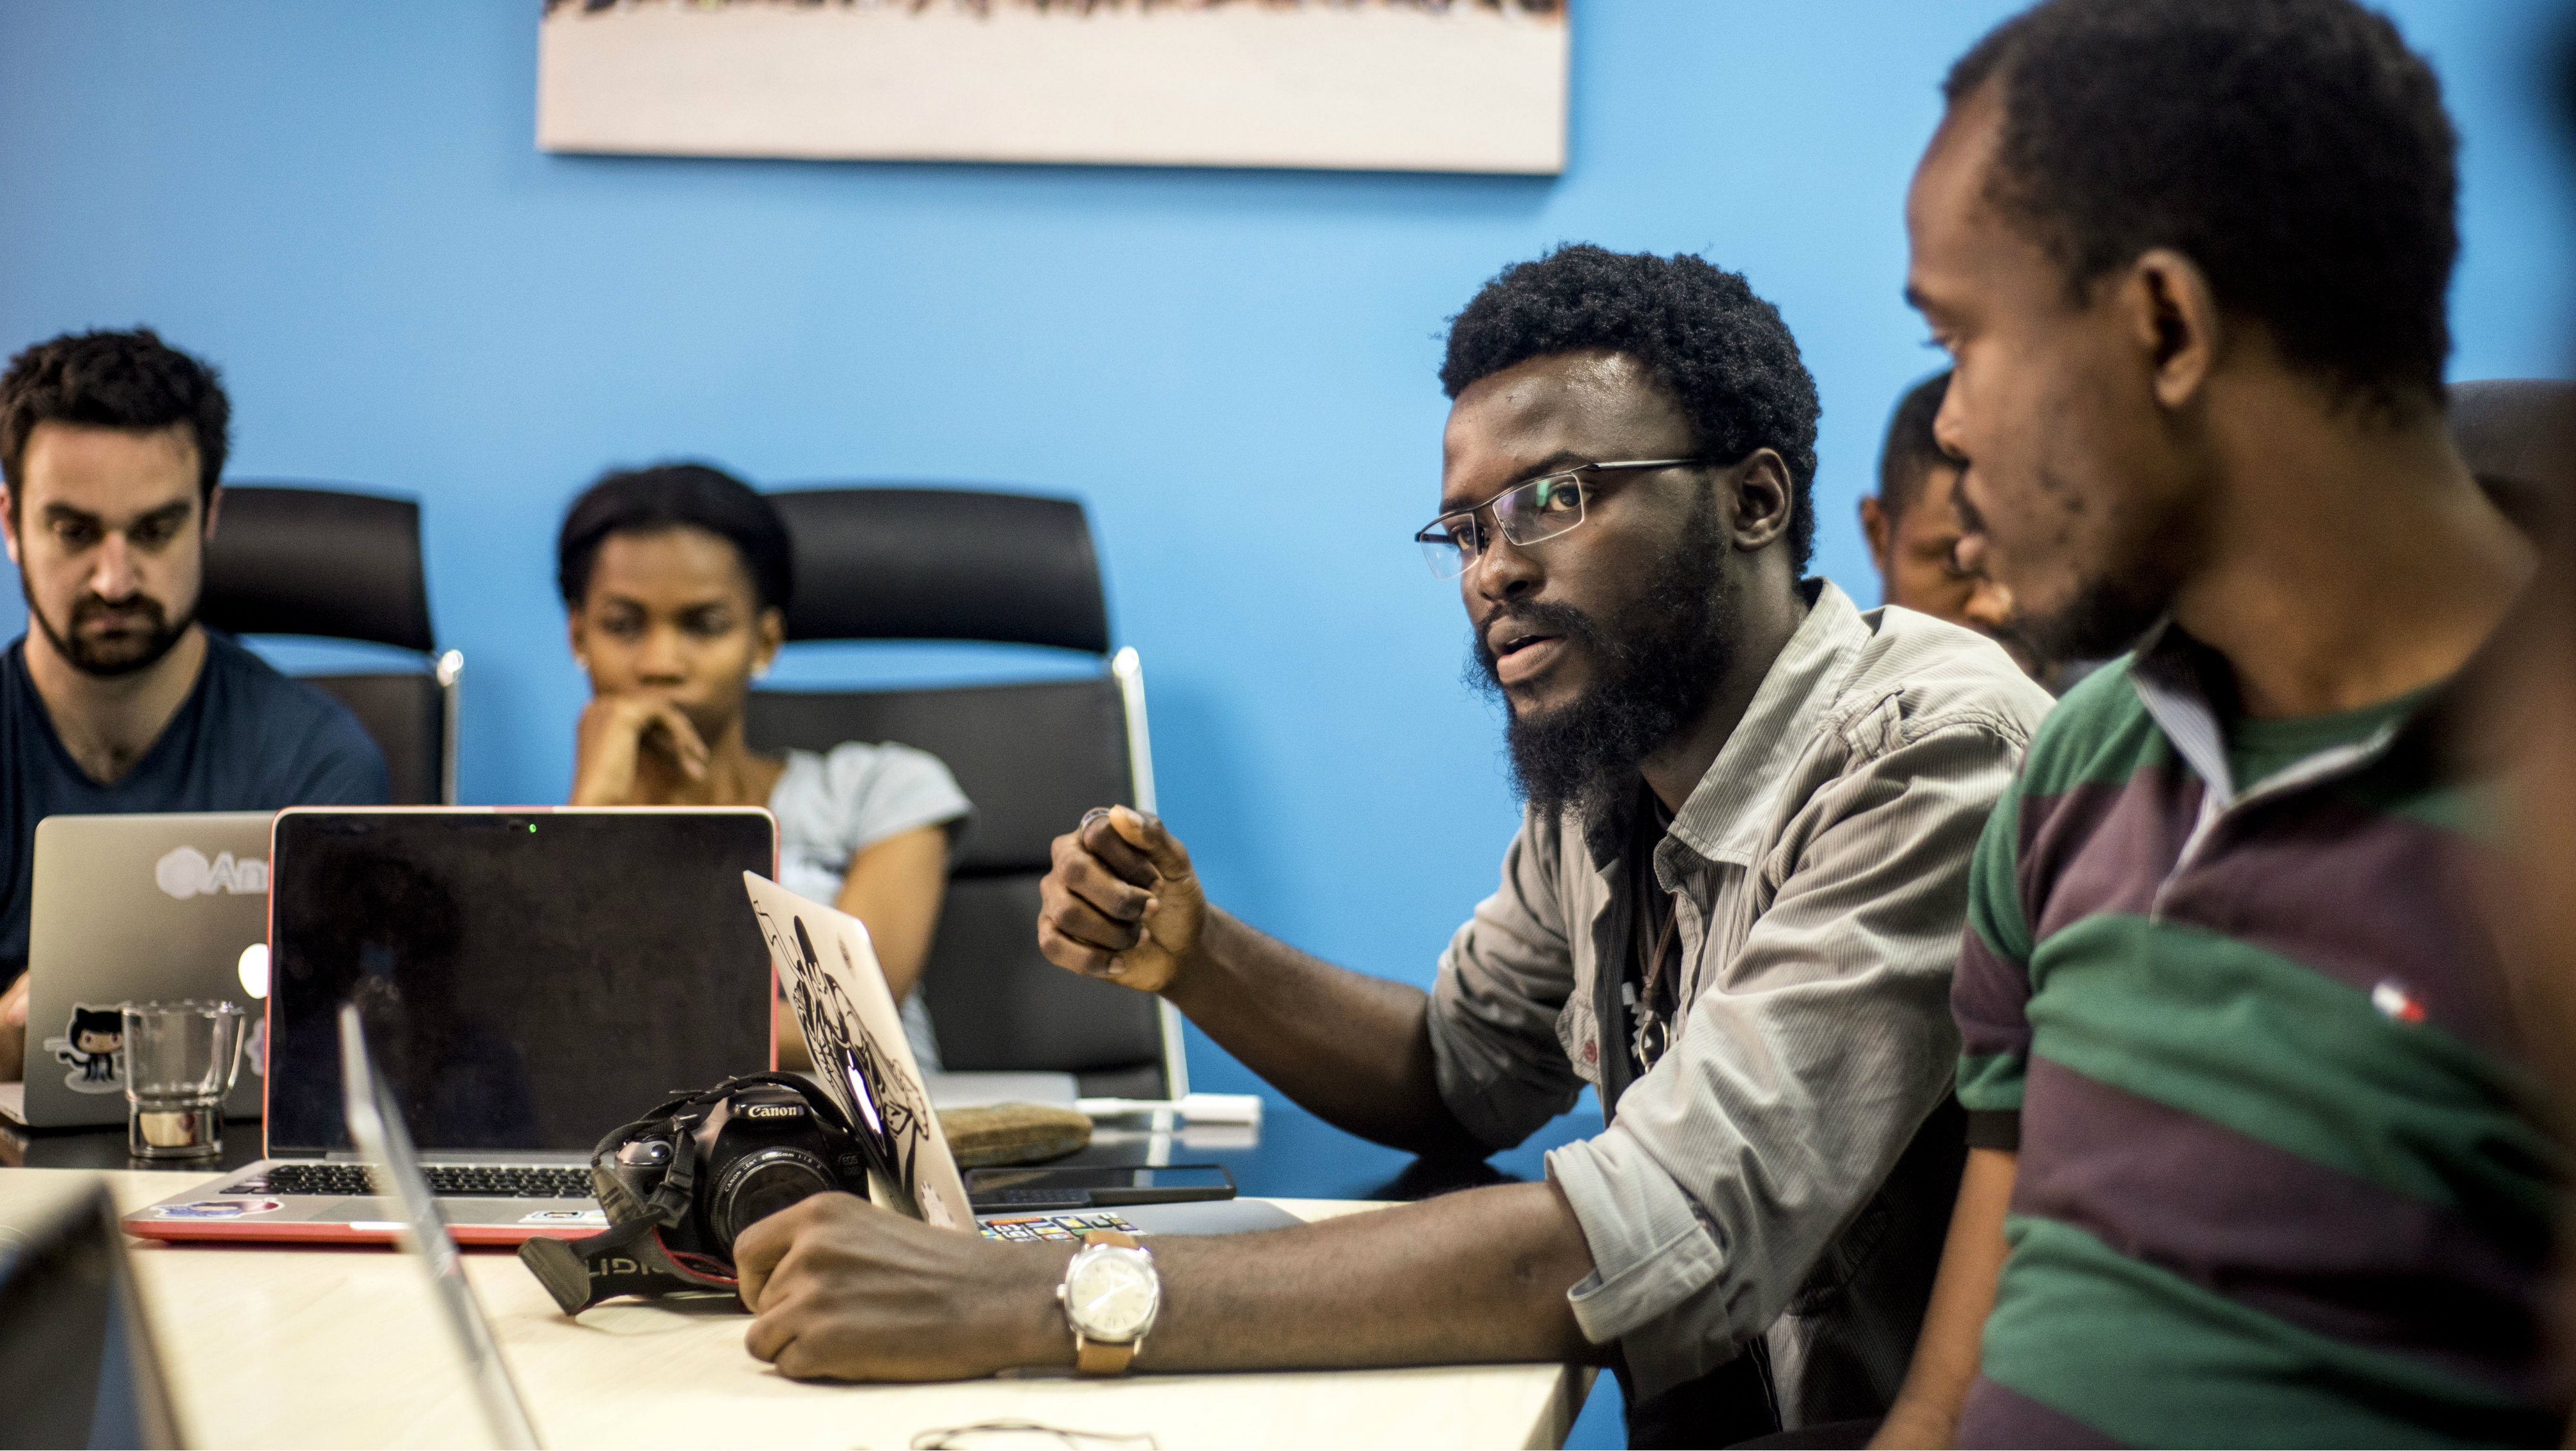 Andela developer Adeleke Togun leading a discussion with his team.Lagos, Nigeria Photo Credit: Andela developer Adeleke Togun leading a discussion with his team.Lagos, Nigeria